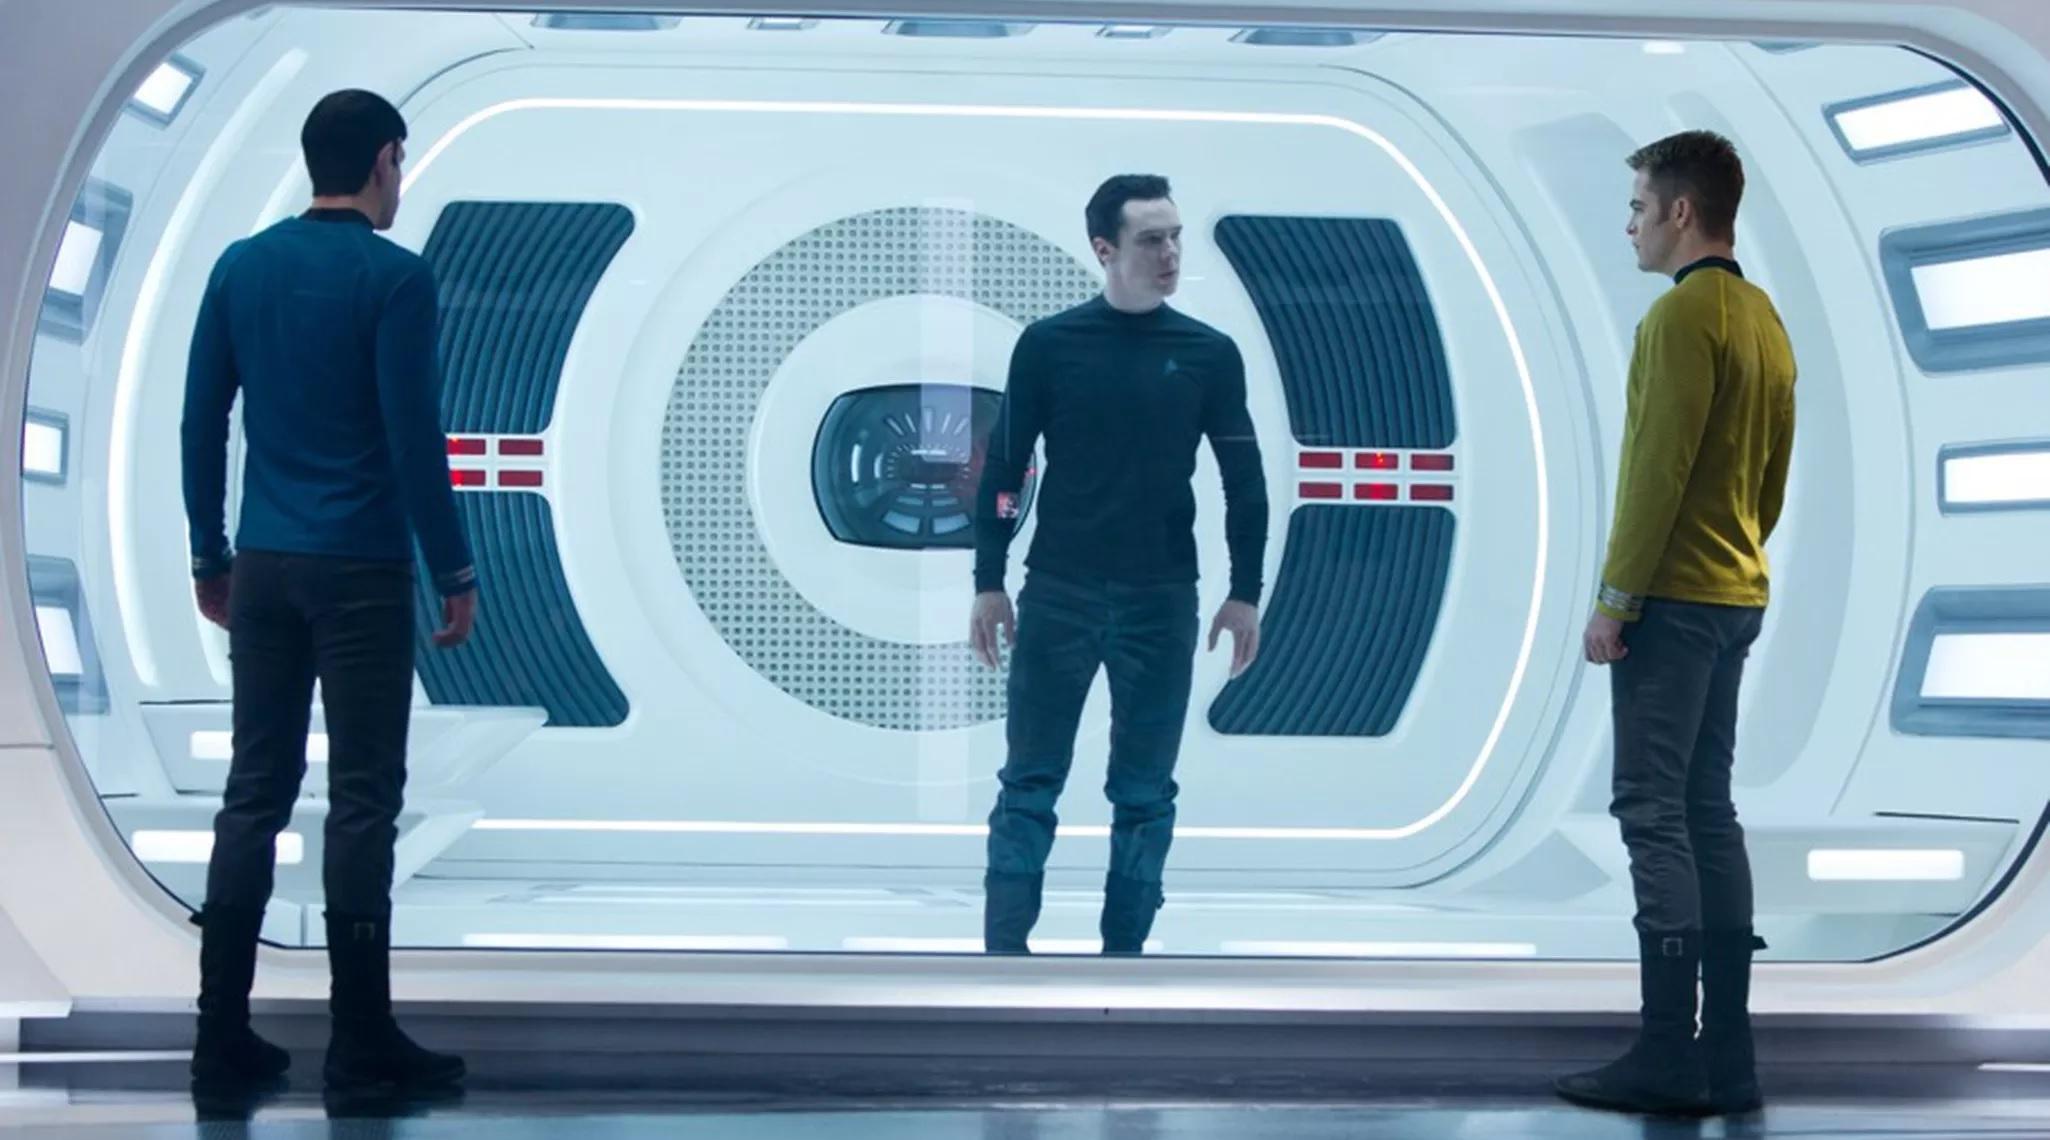 17. Star Trek Into Darkness